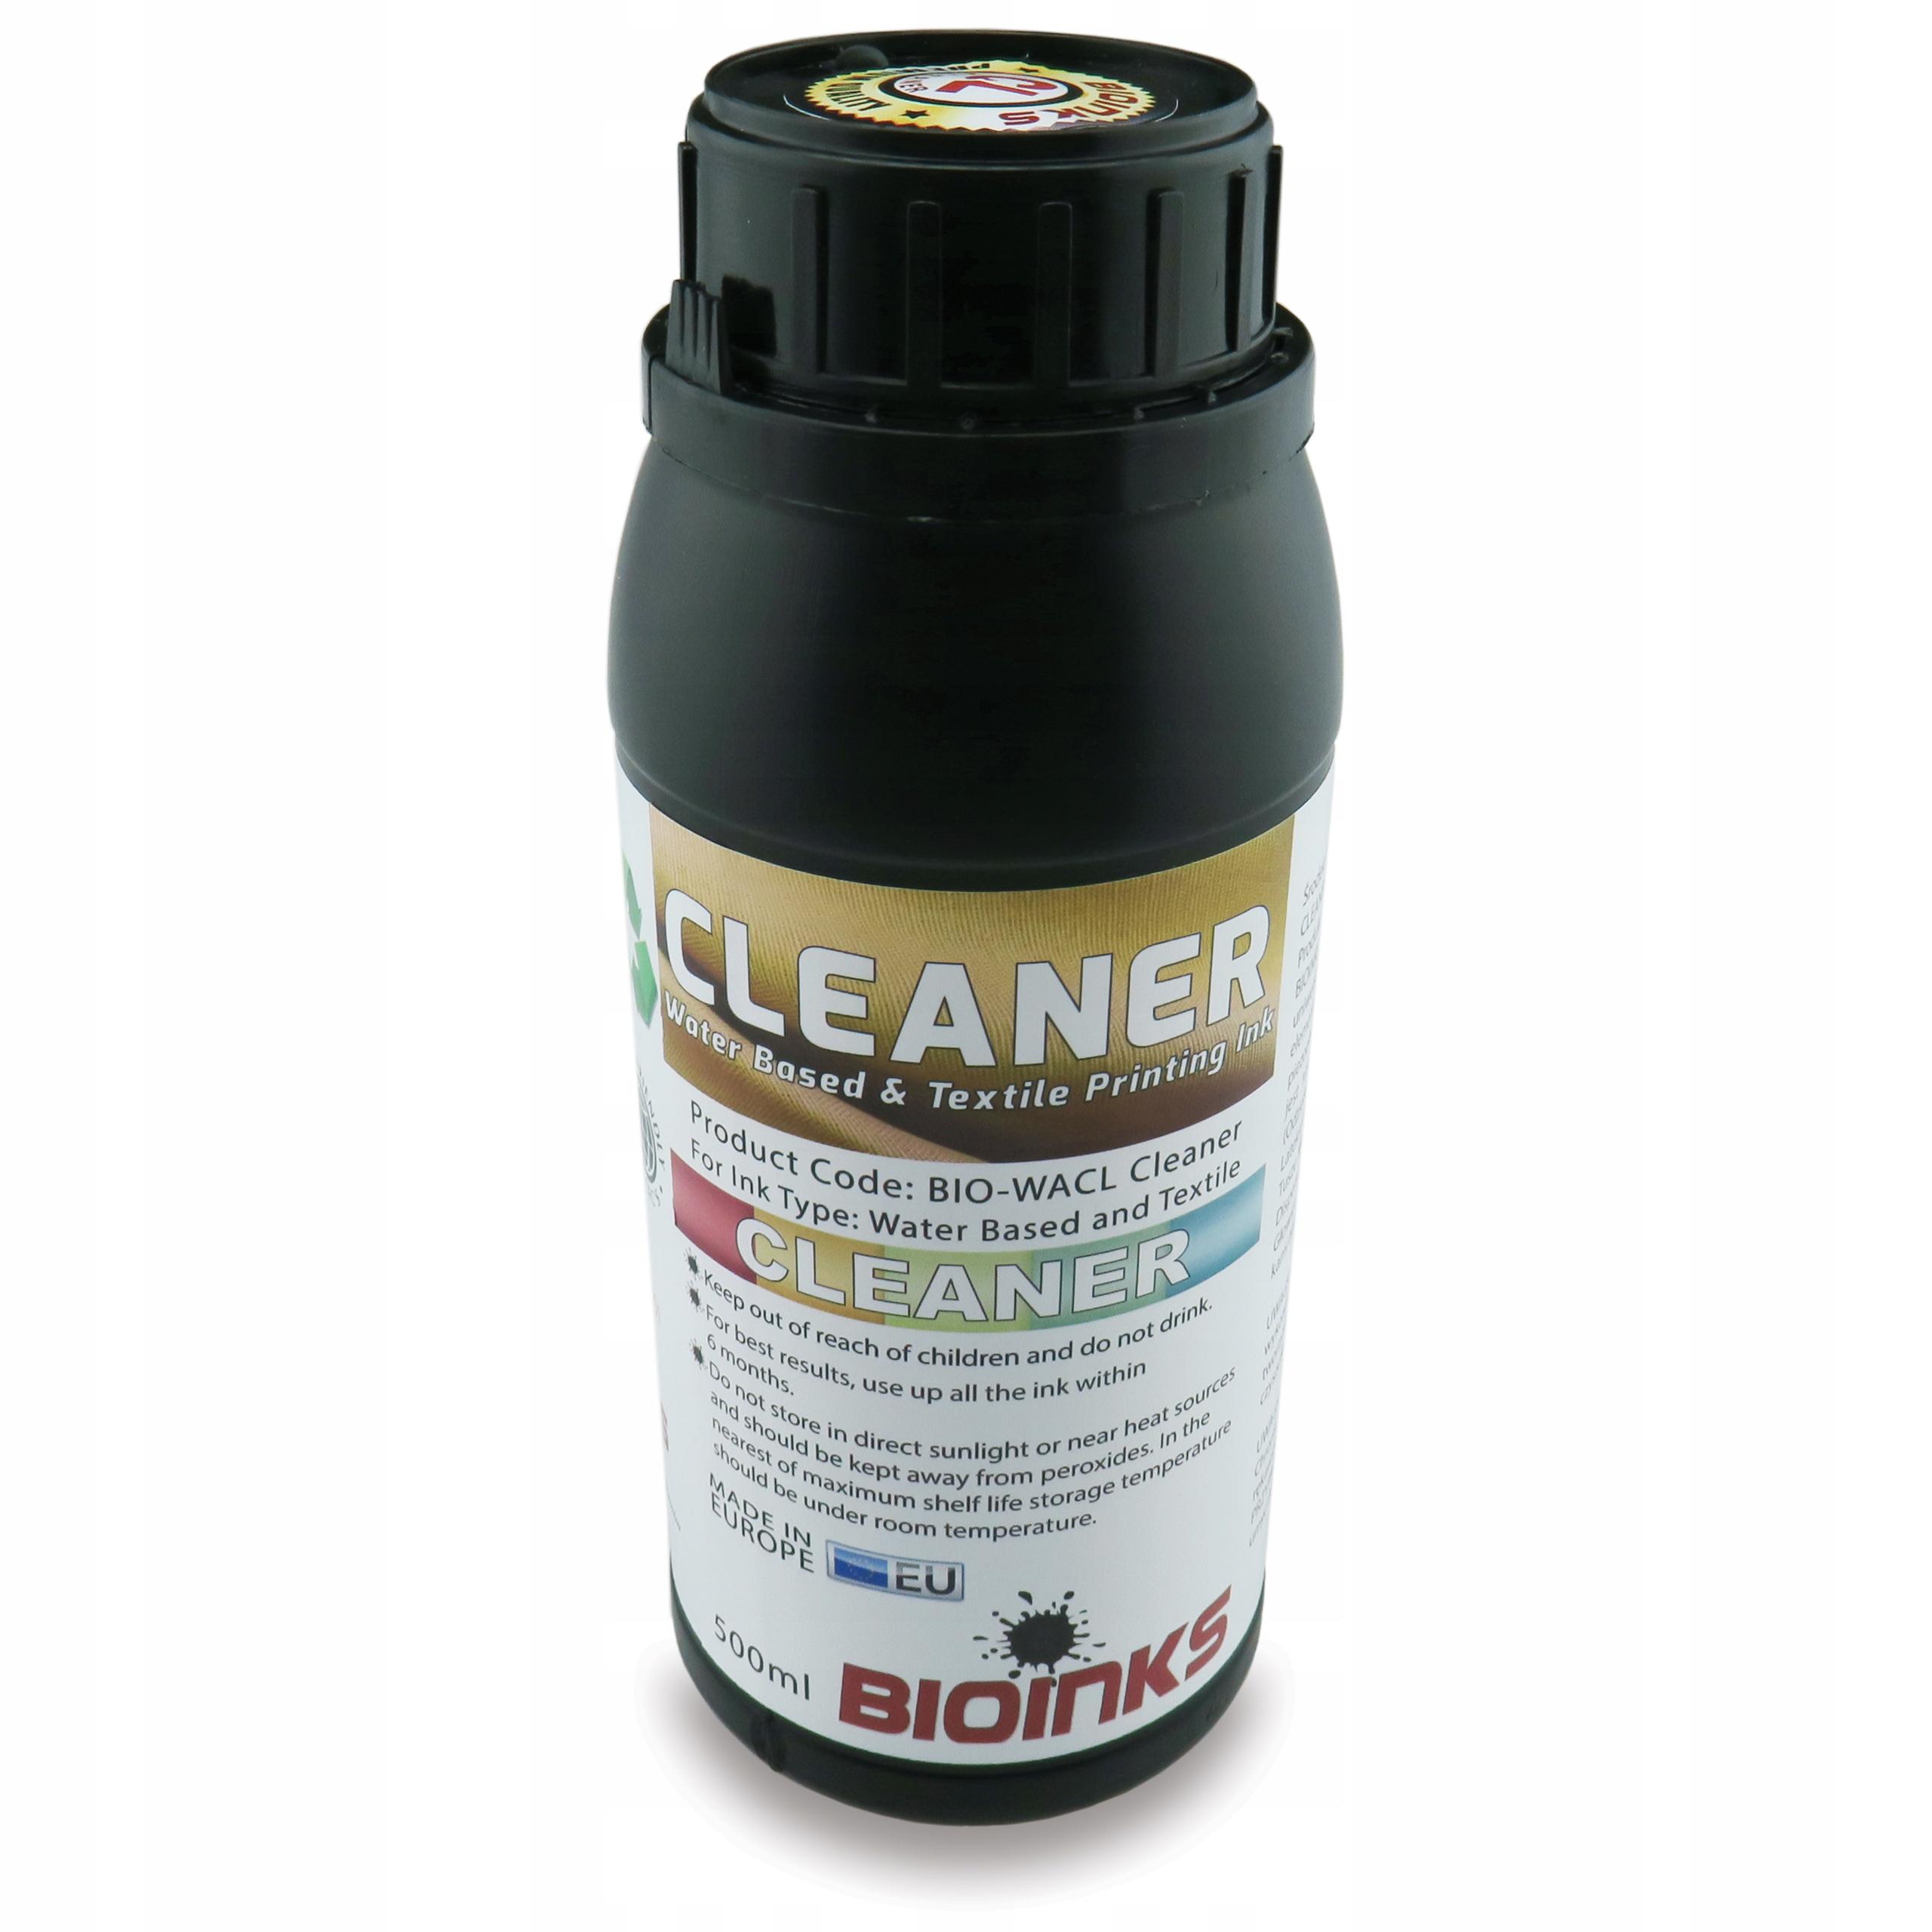 Bionks Bio-WACL-Cleaner - 500ml čistič